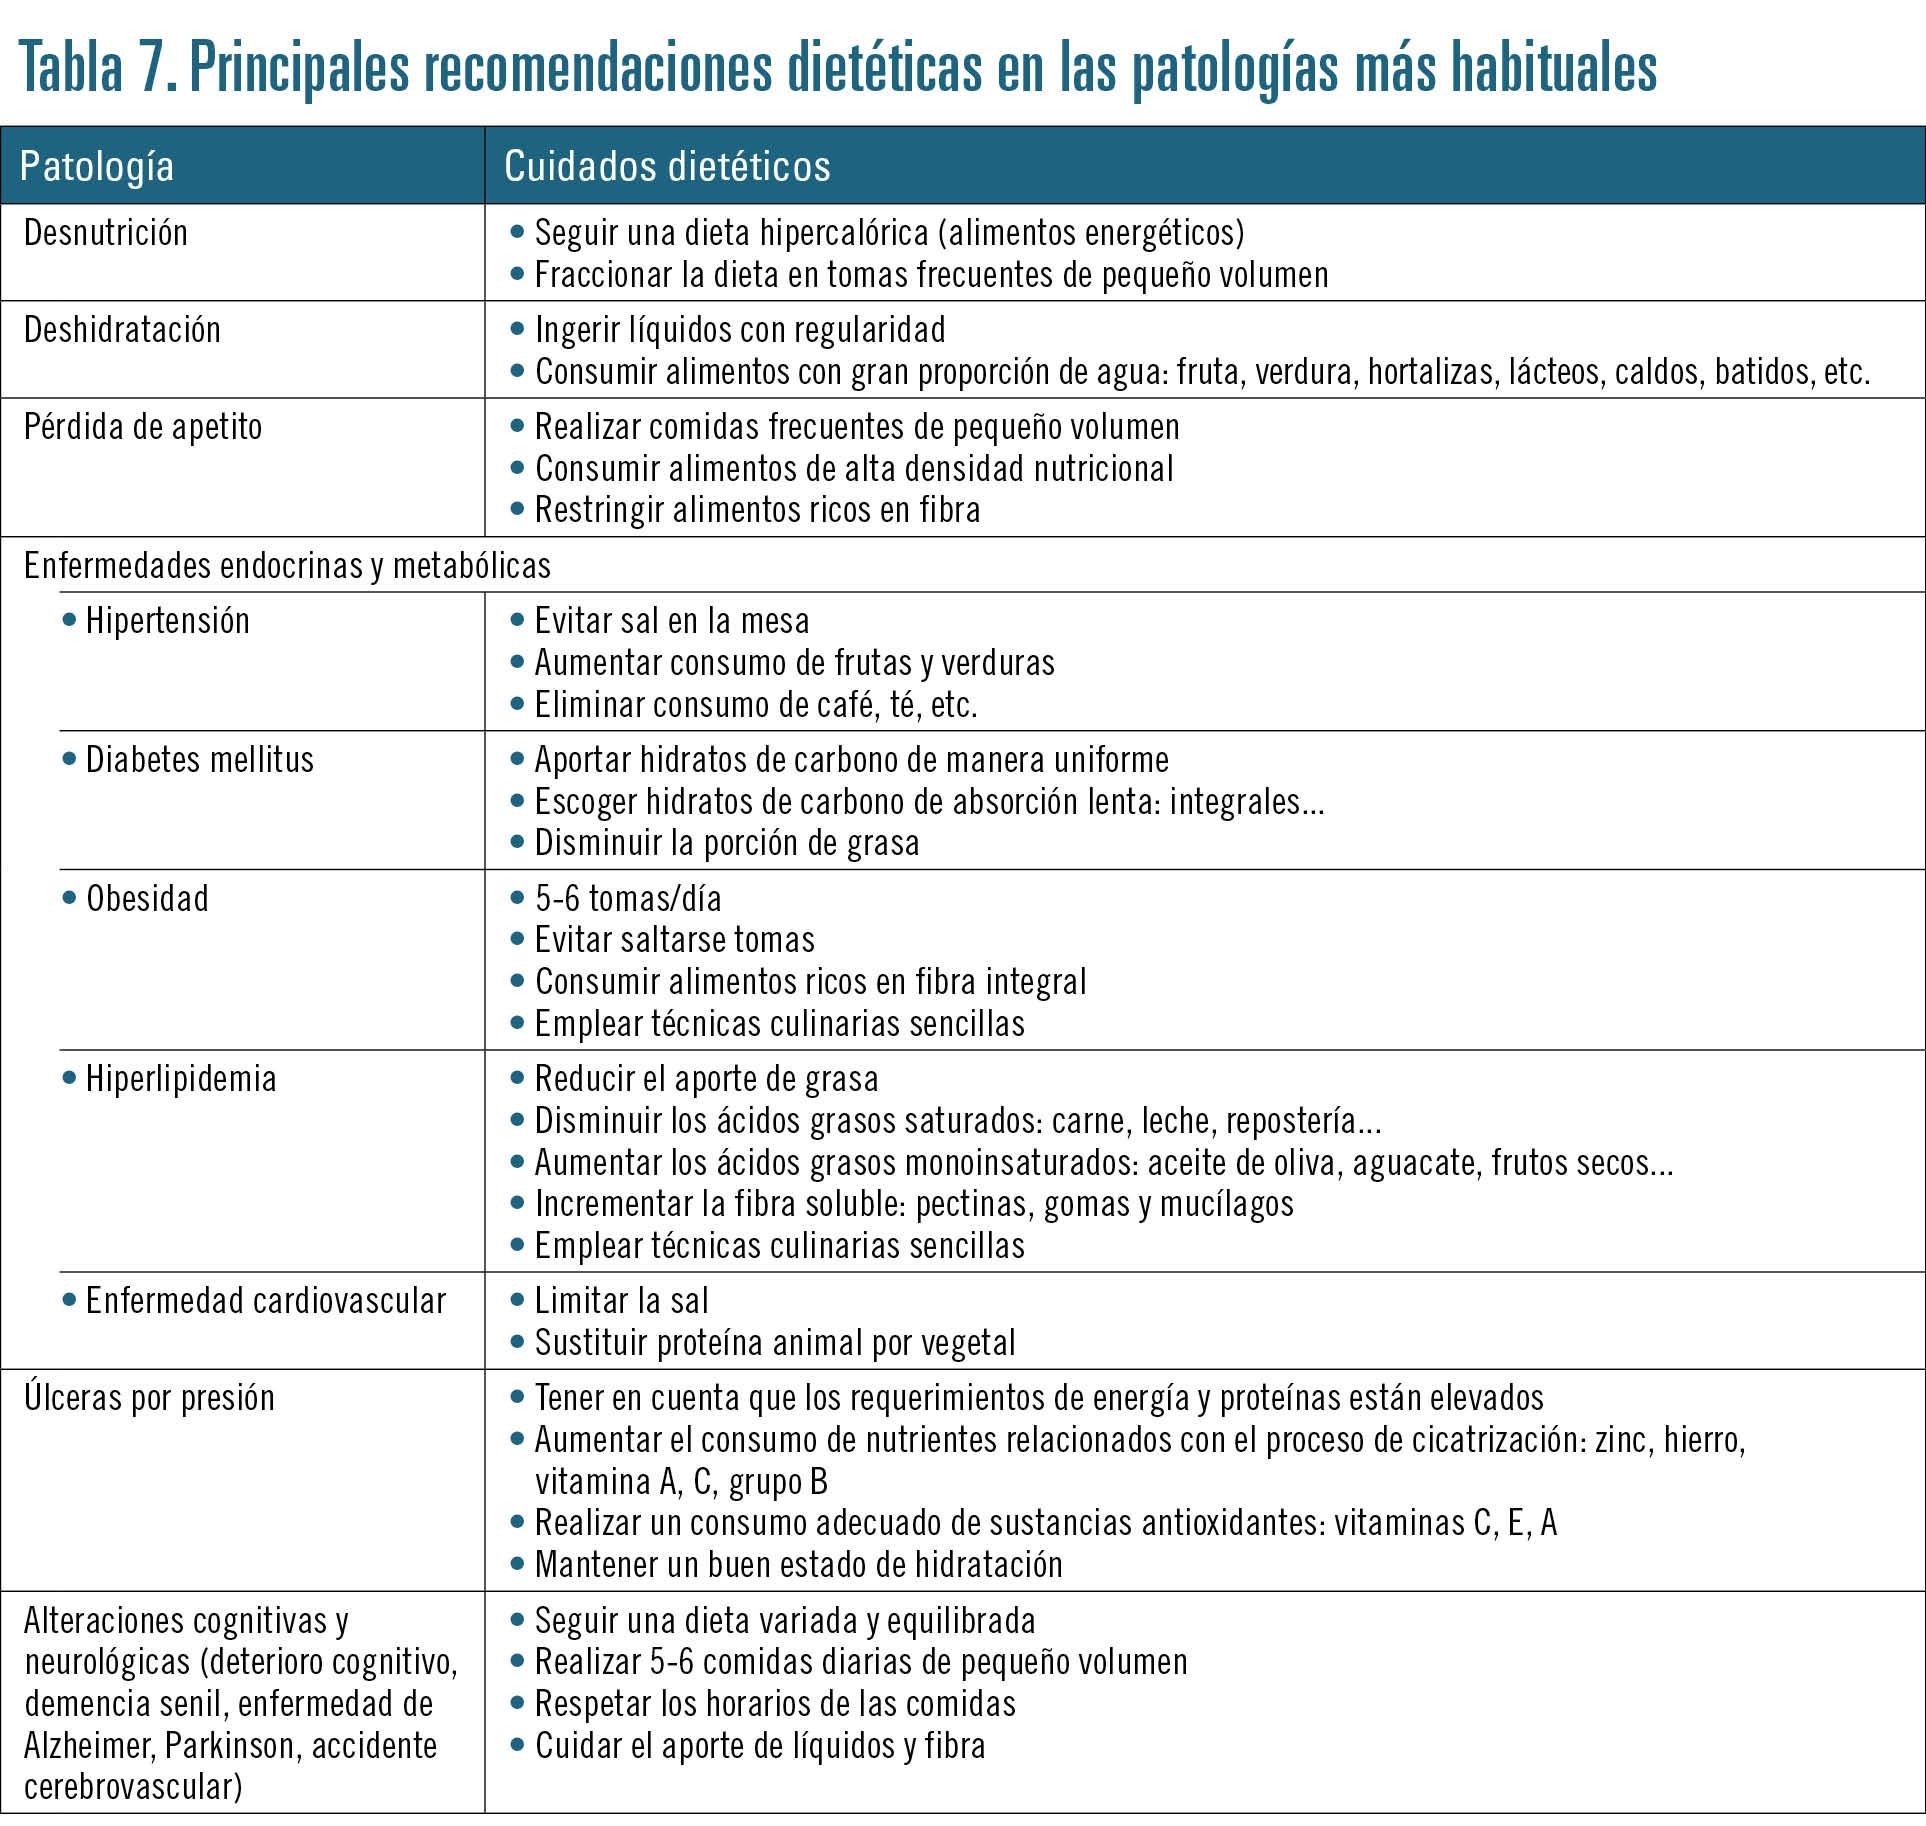 TABLA 7 CURSO